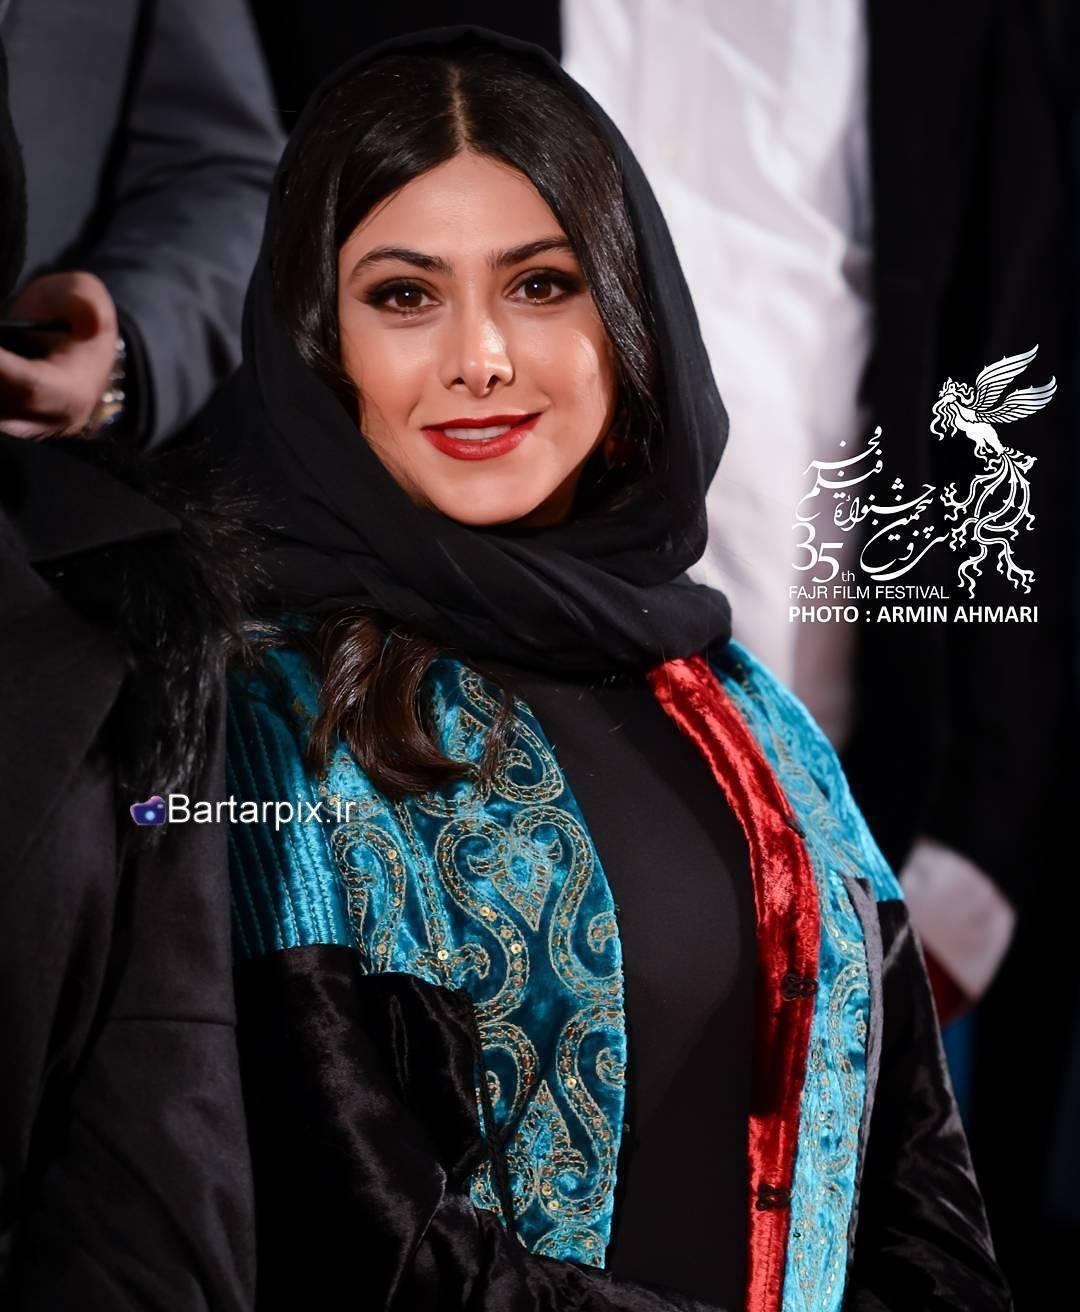 http://s2.picofile.com/file/8285145200/www_bartarpix_ir_azadeh_samadi_fajr_festival_95_4_.jpg